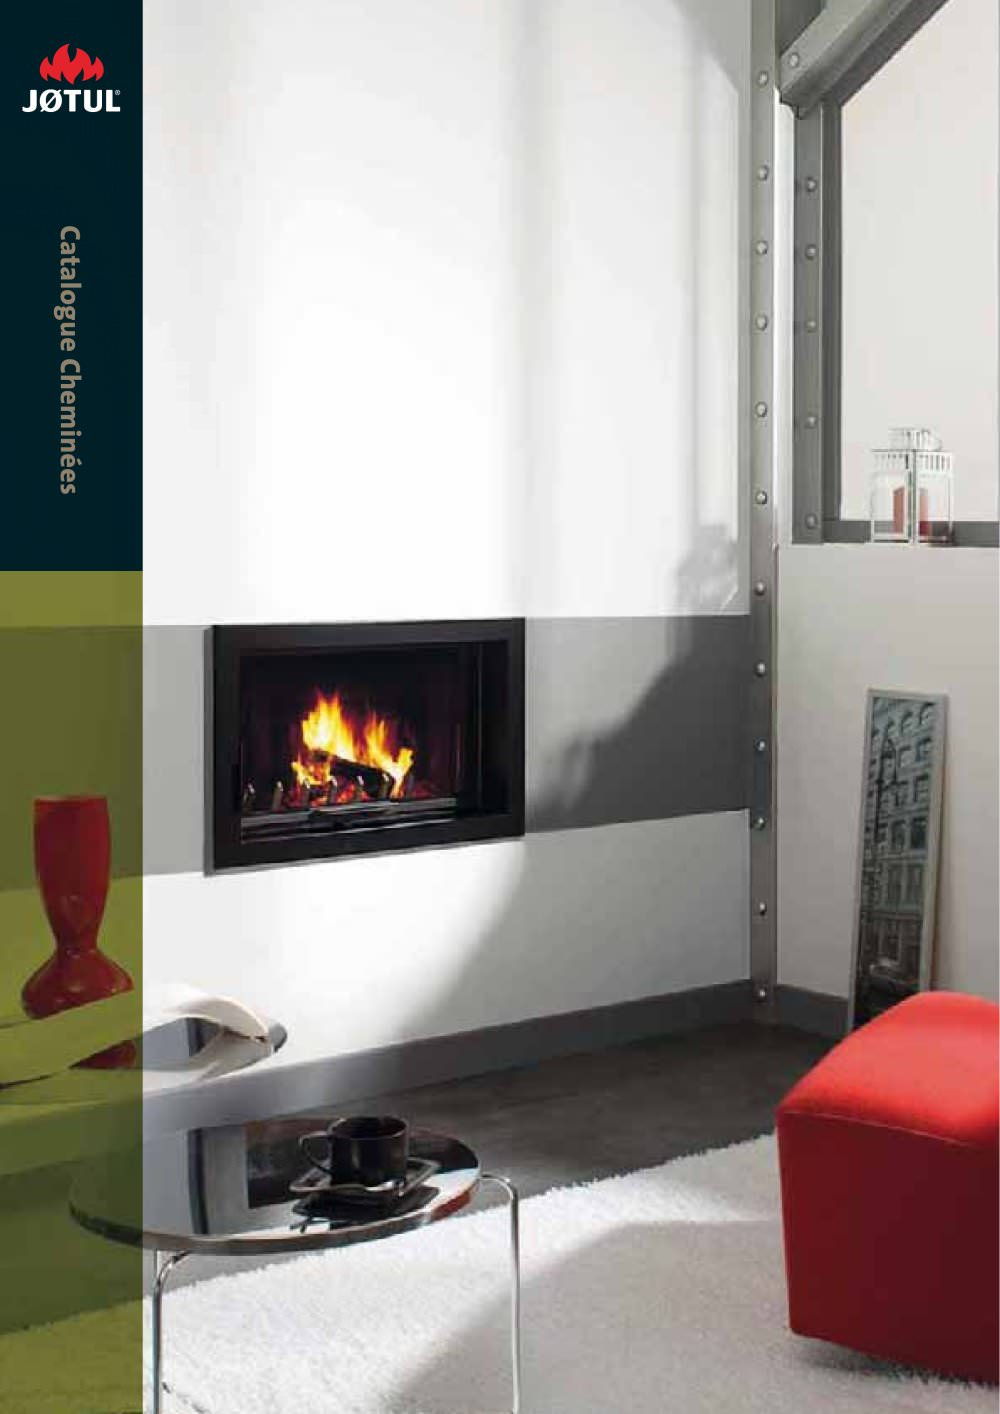 Catalogue Cheminees Jotul Catalogue Pdf Documentation Brochure